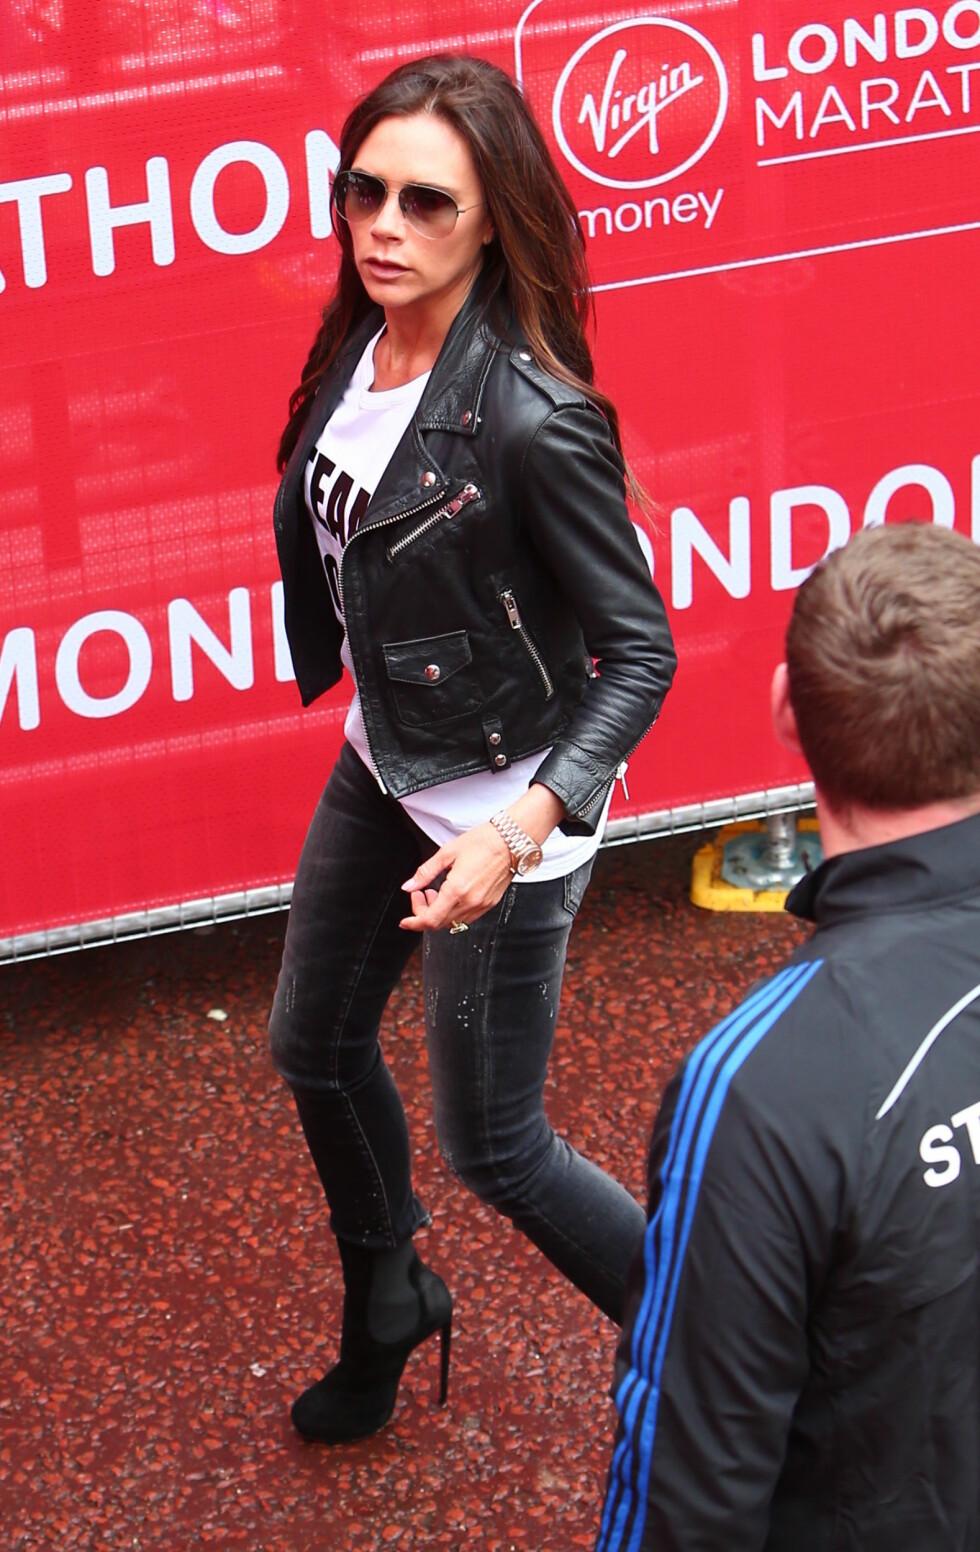 «SPORTY»: Da Victoria Beckham heiet på sønnen Brooklyn under London Marathon forrige helg, var hun selvsagt iført høye hæler.  Foto: wenn.com